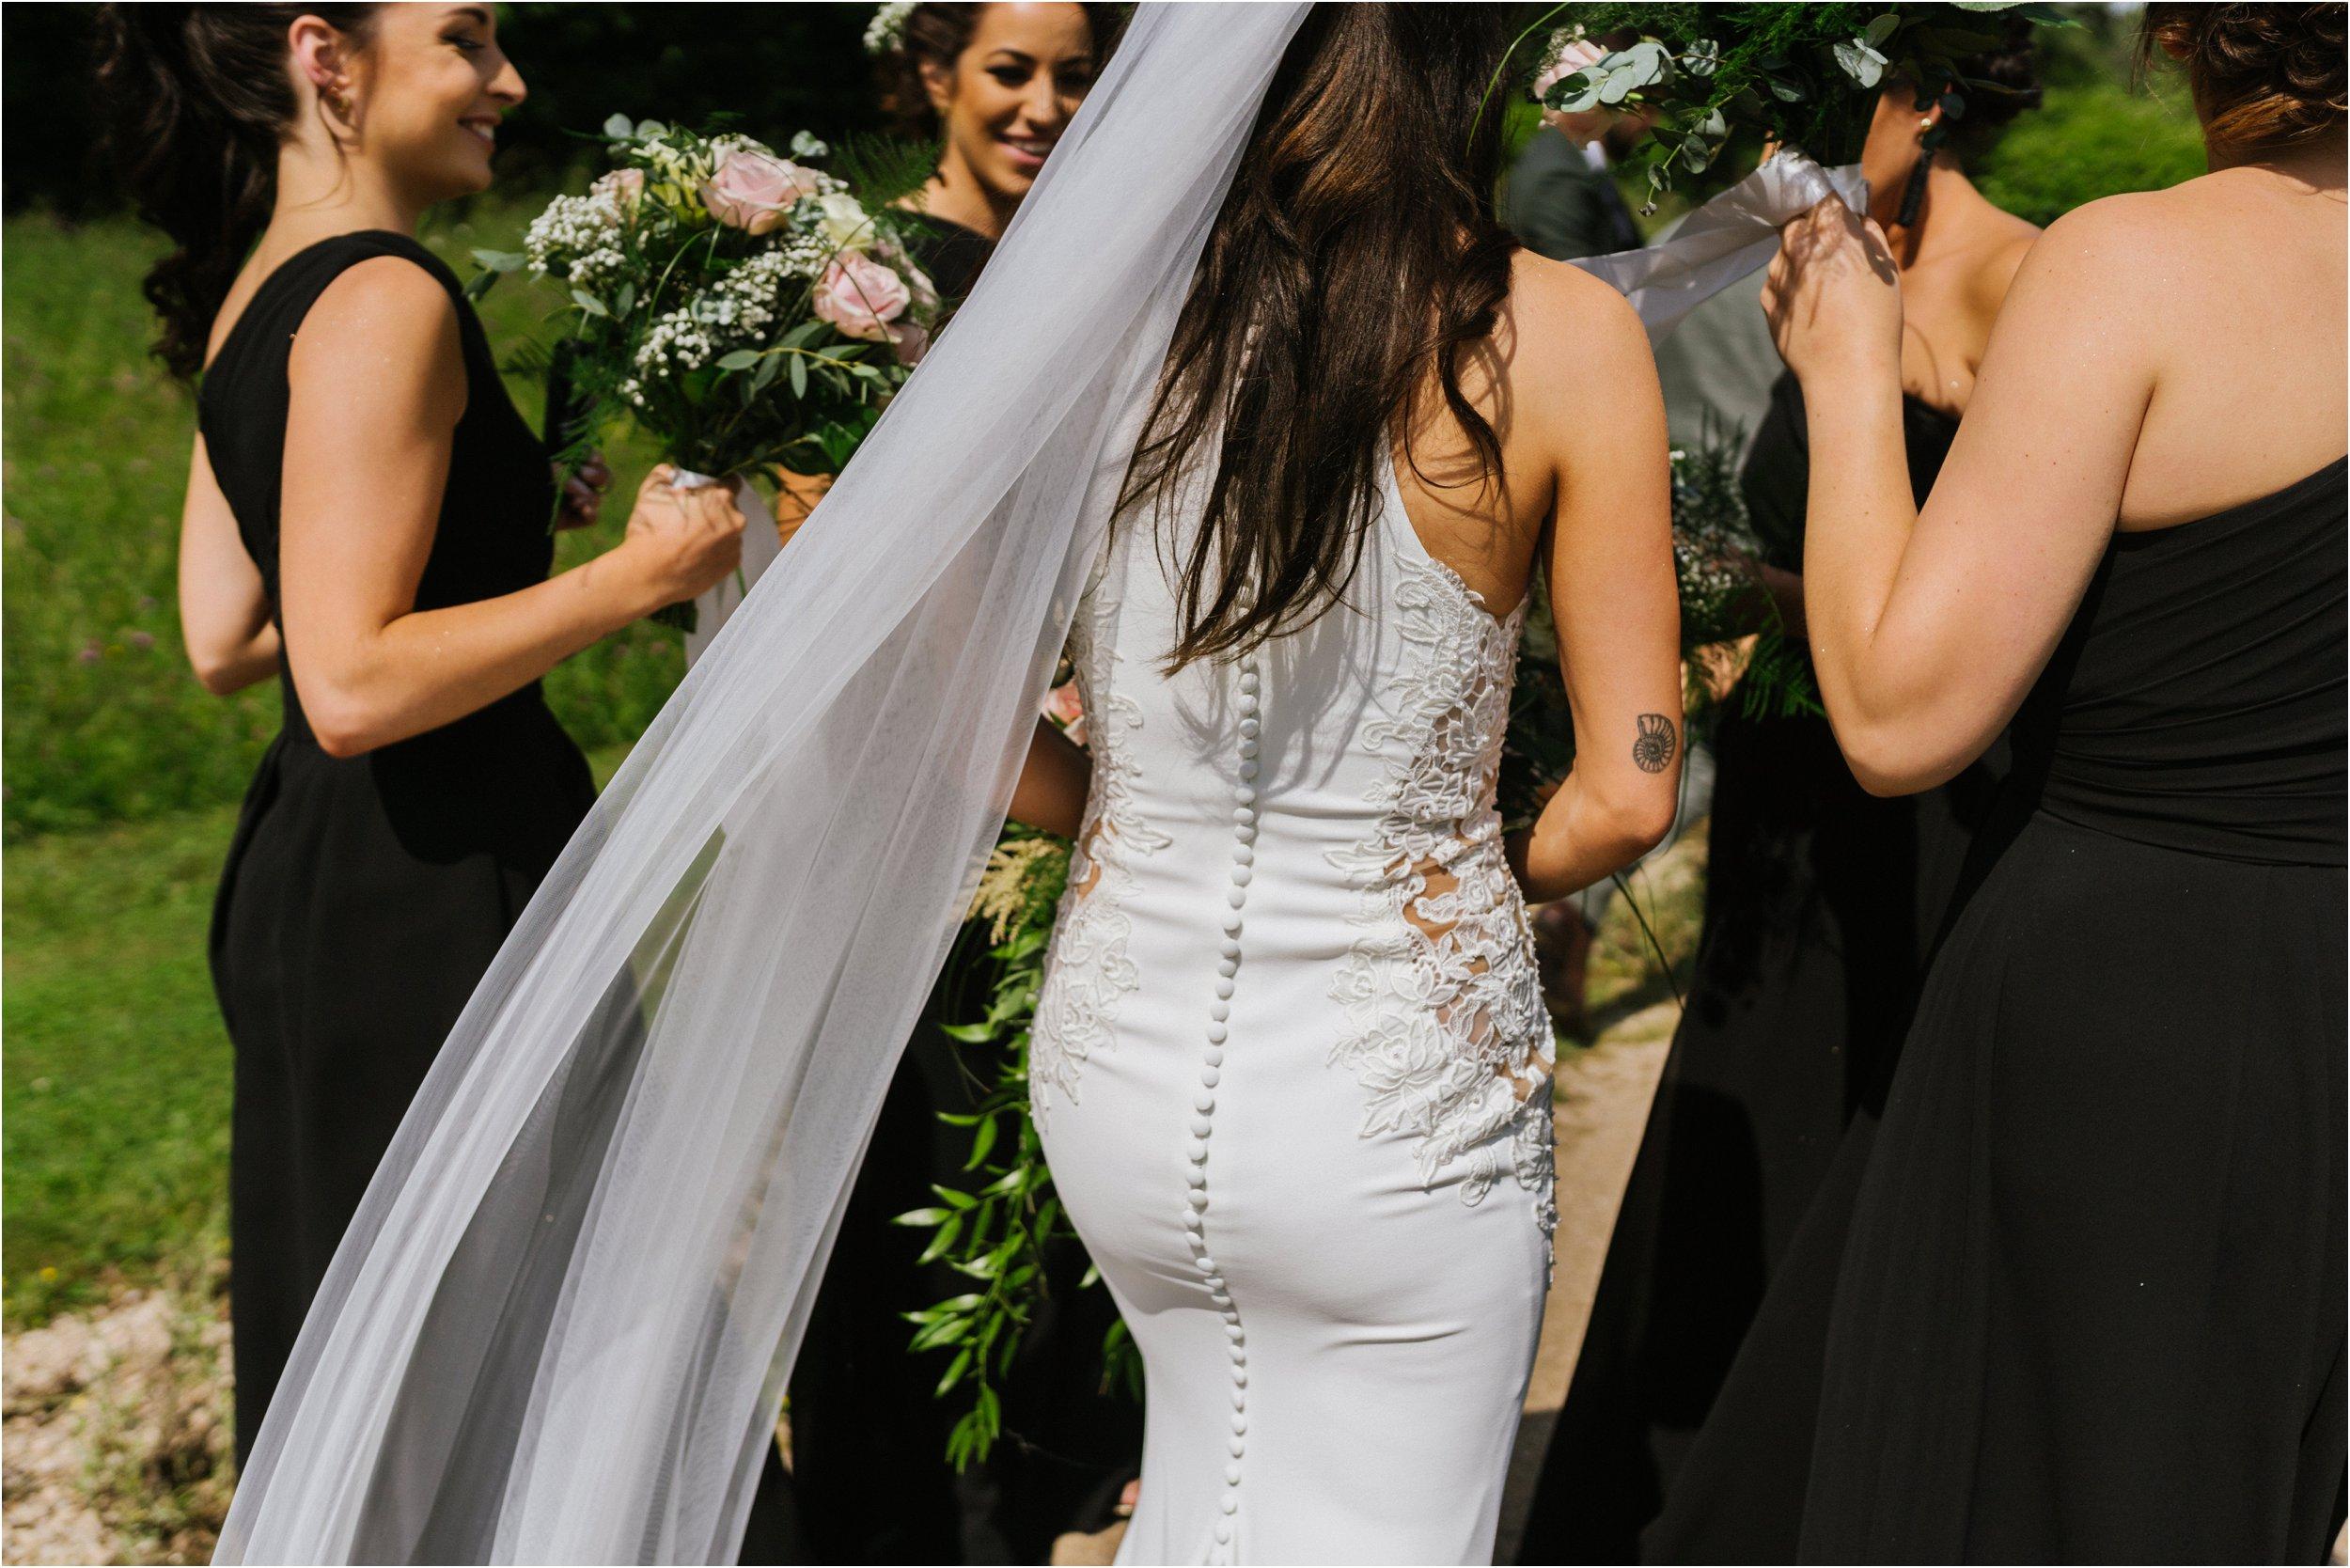 Compton Verney wedding photography_0079.jpg